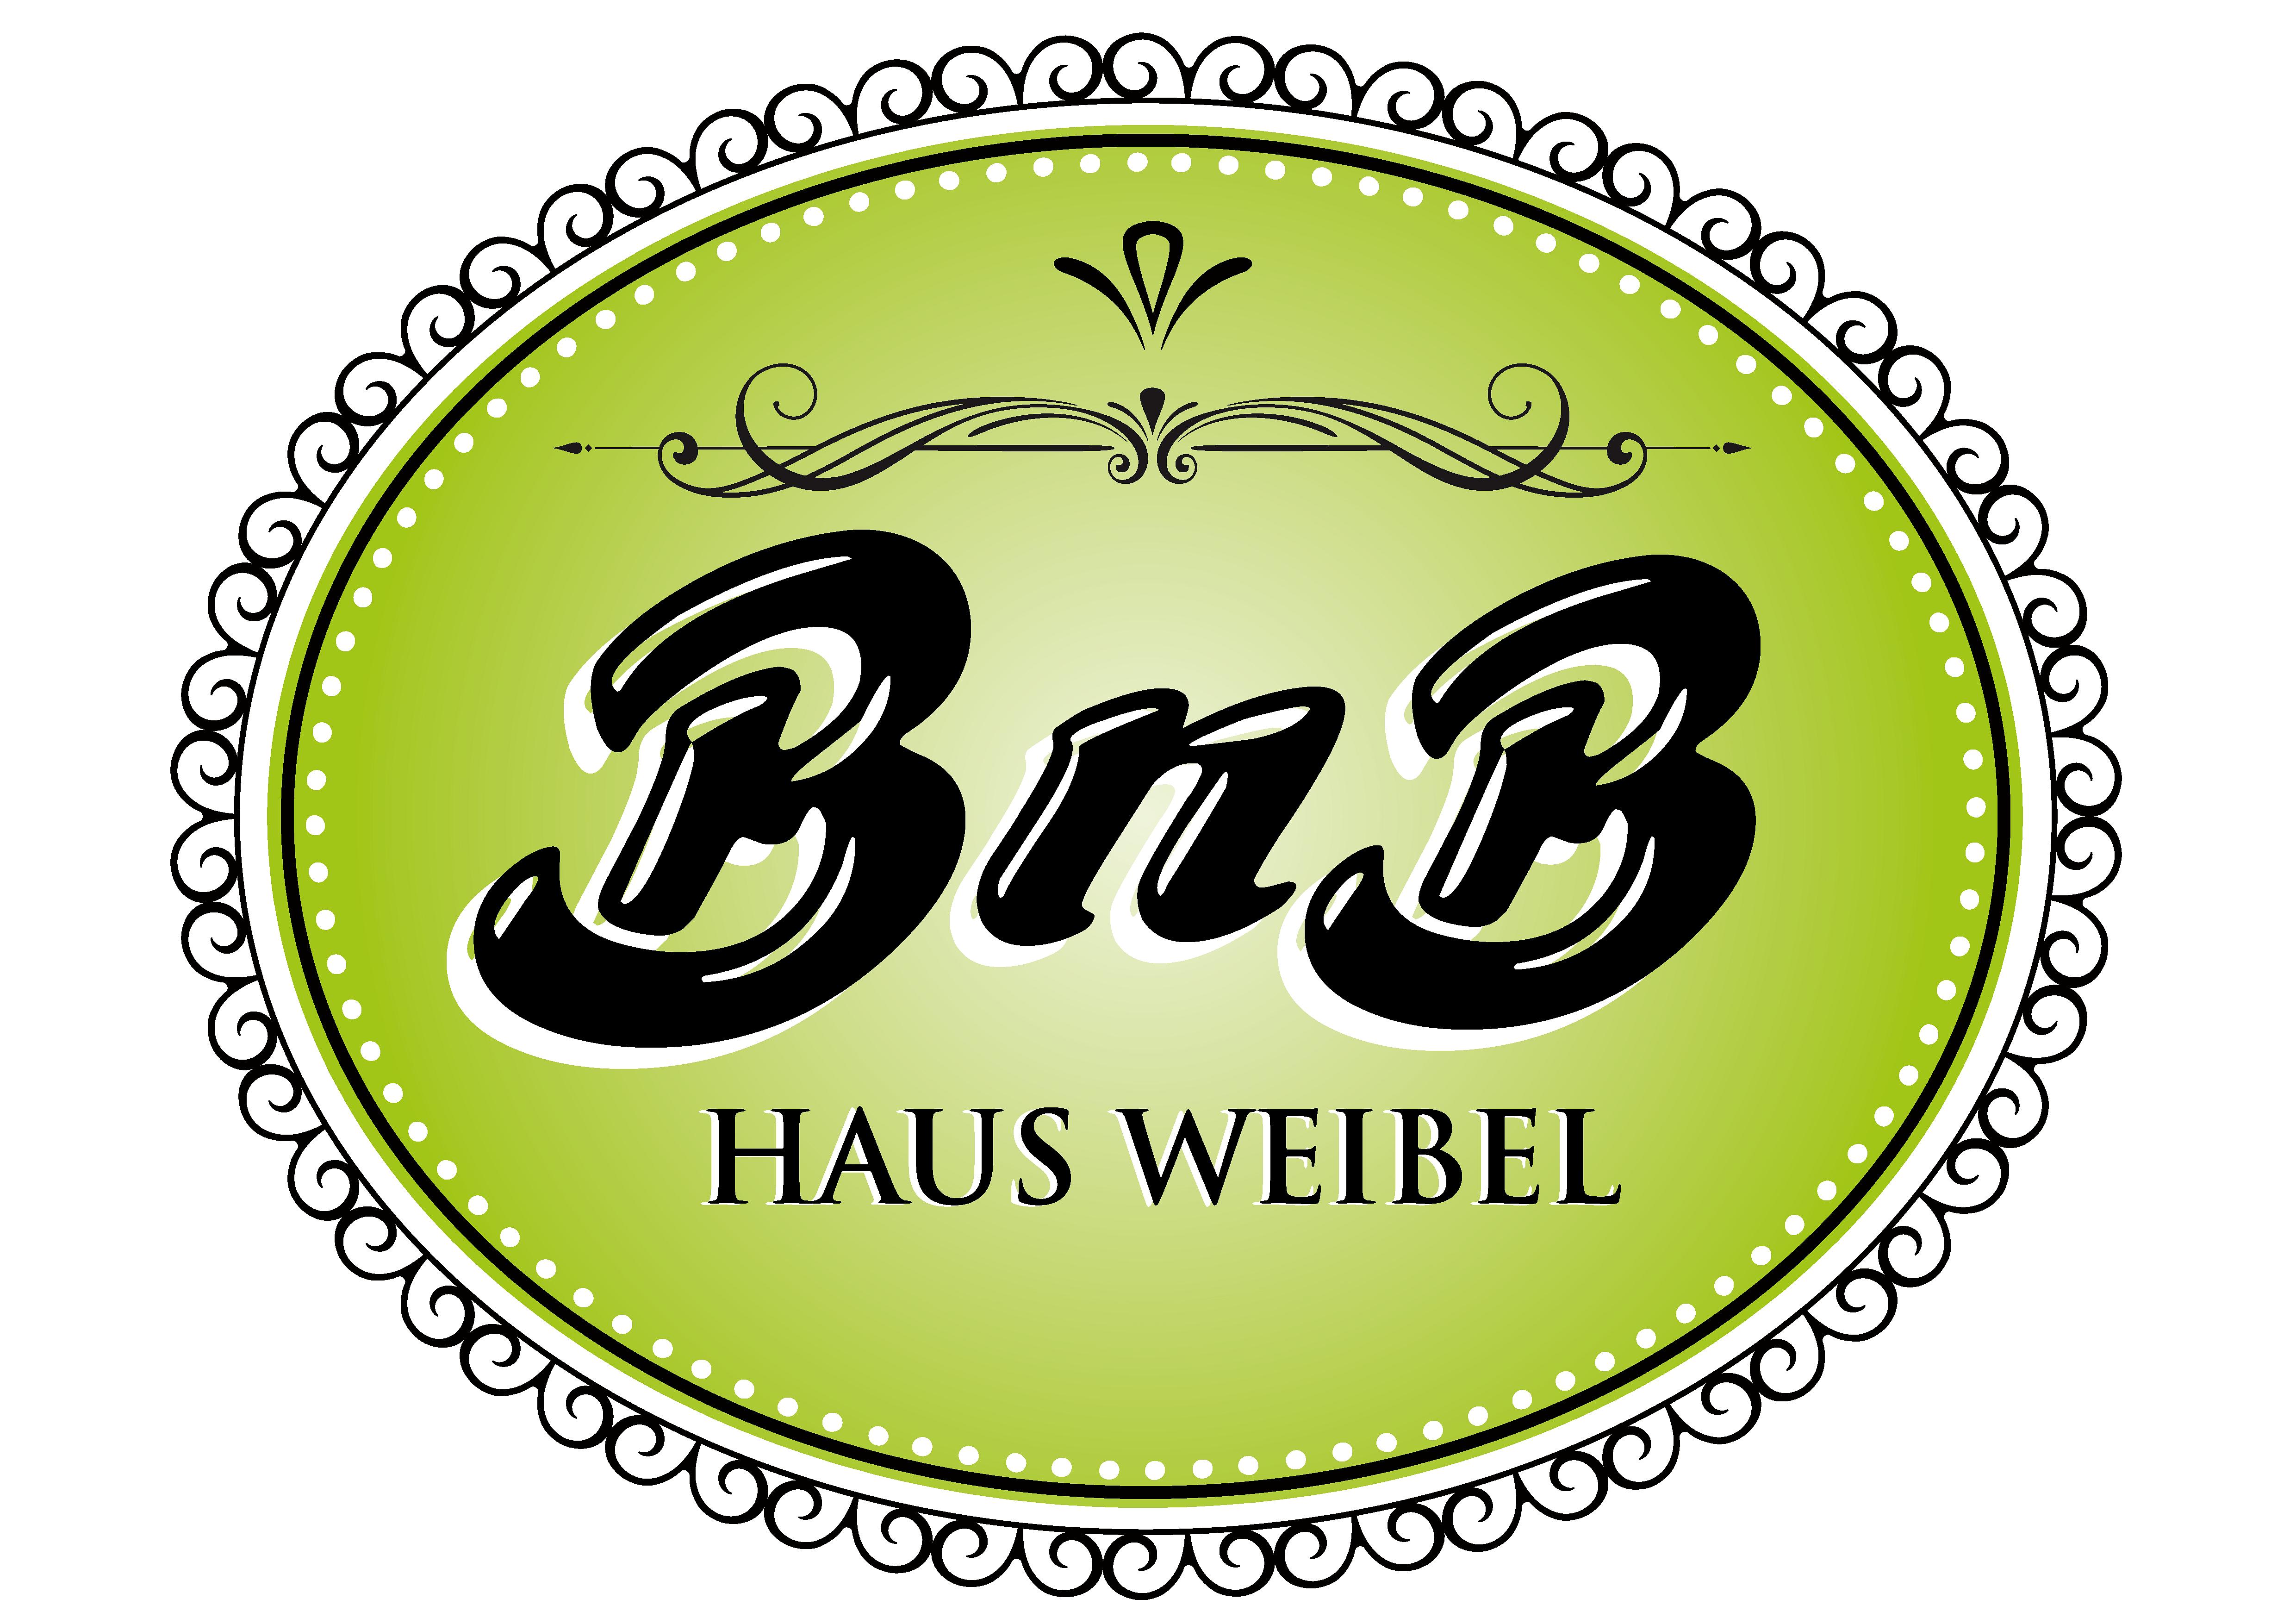 BnB Haus Weibel GmbH